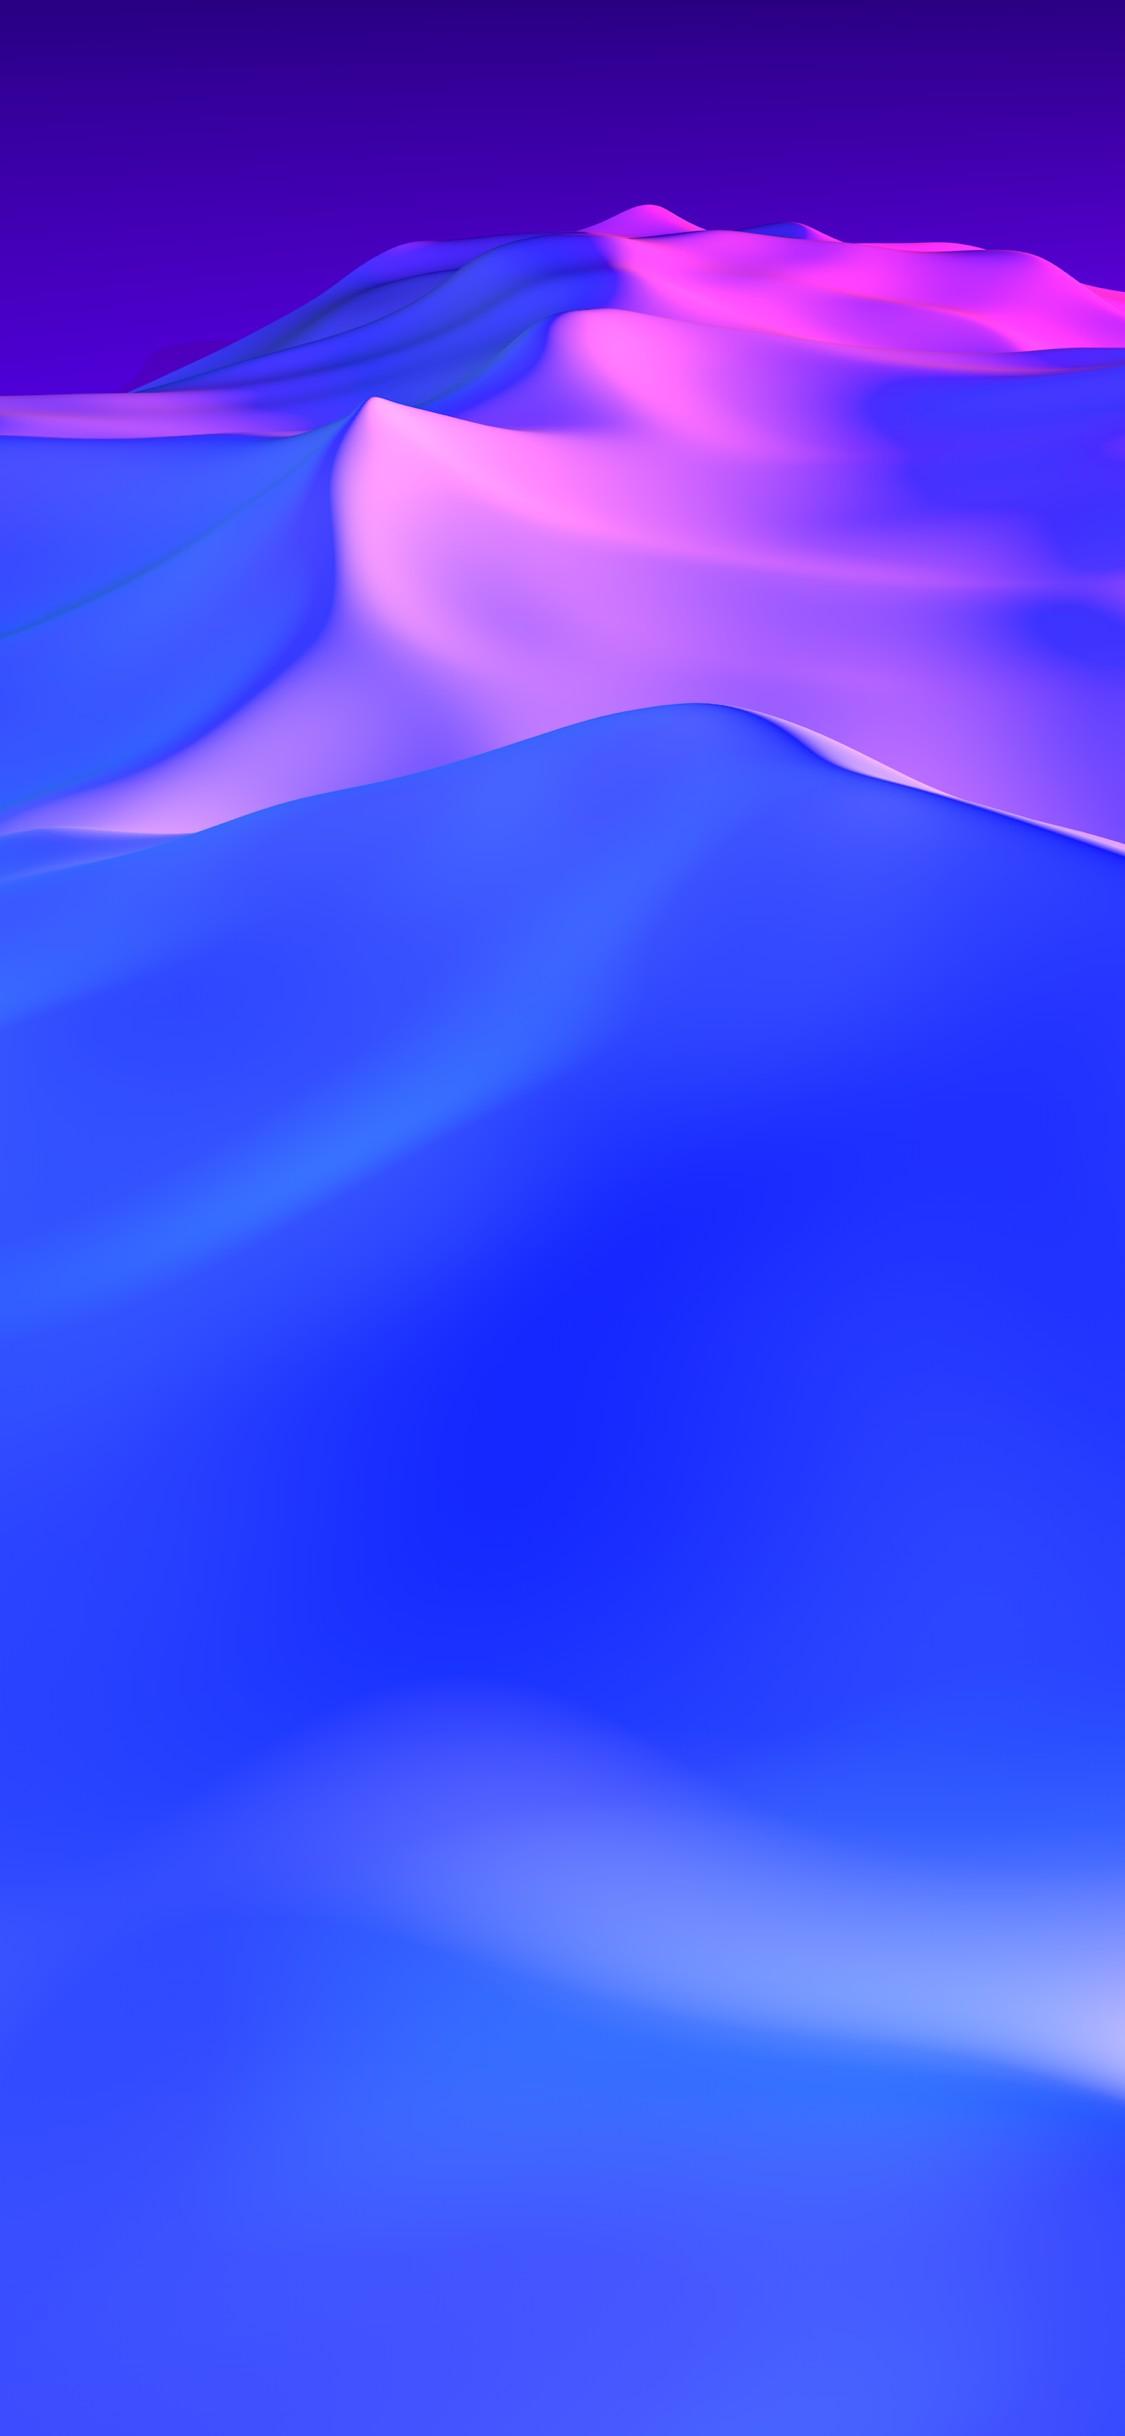 Iphone X Home Screen Wallpaper With High-resolution - Hình Nền Iphone X - HD Wallpaper